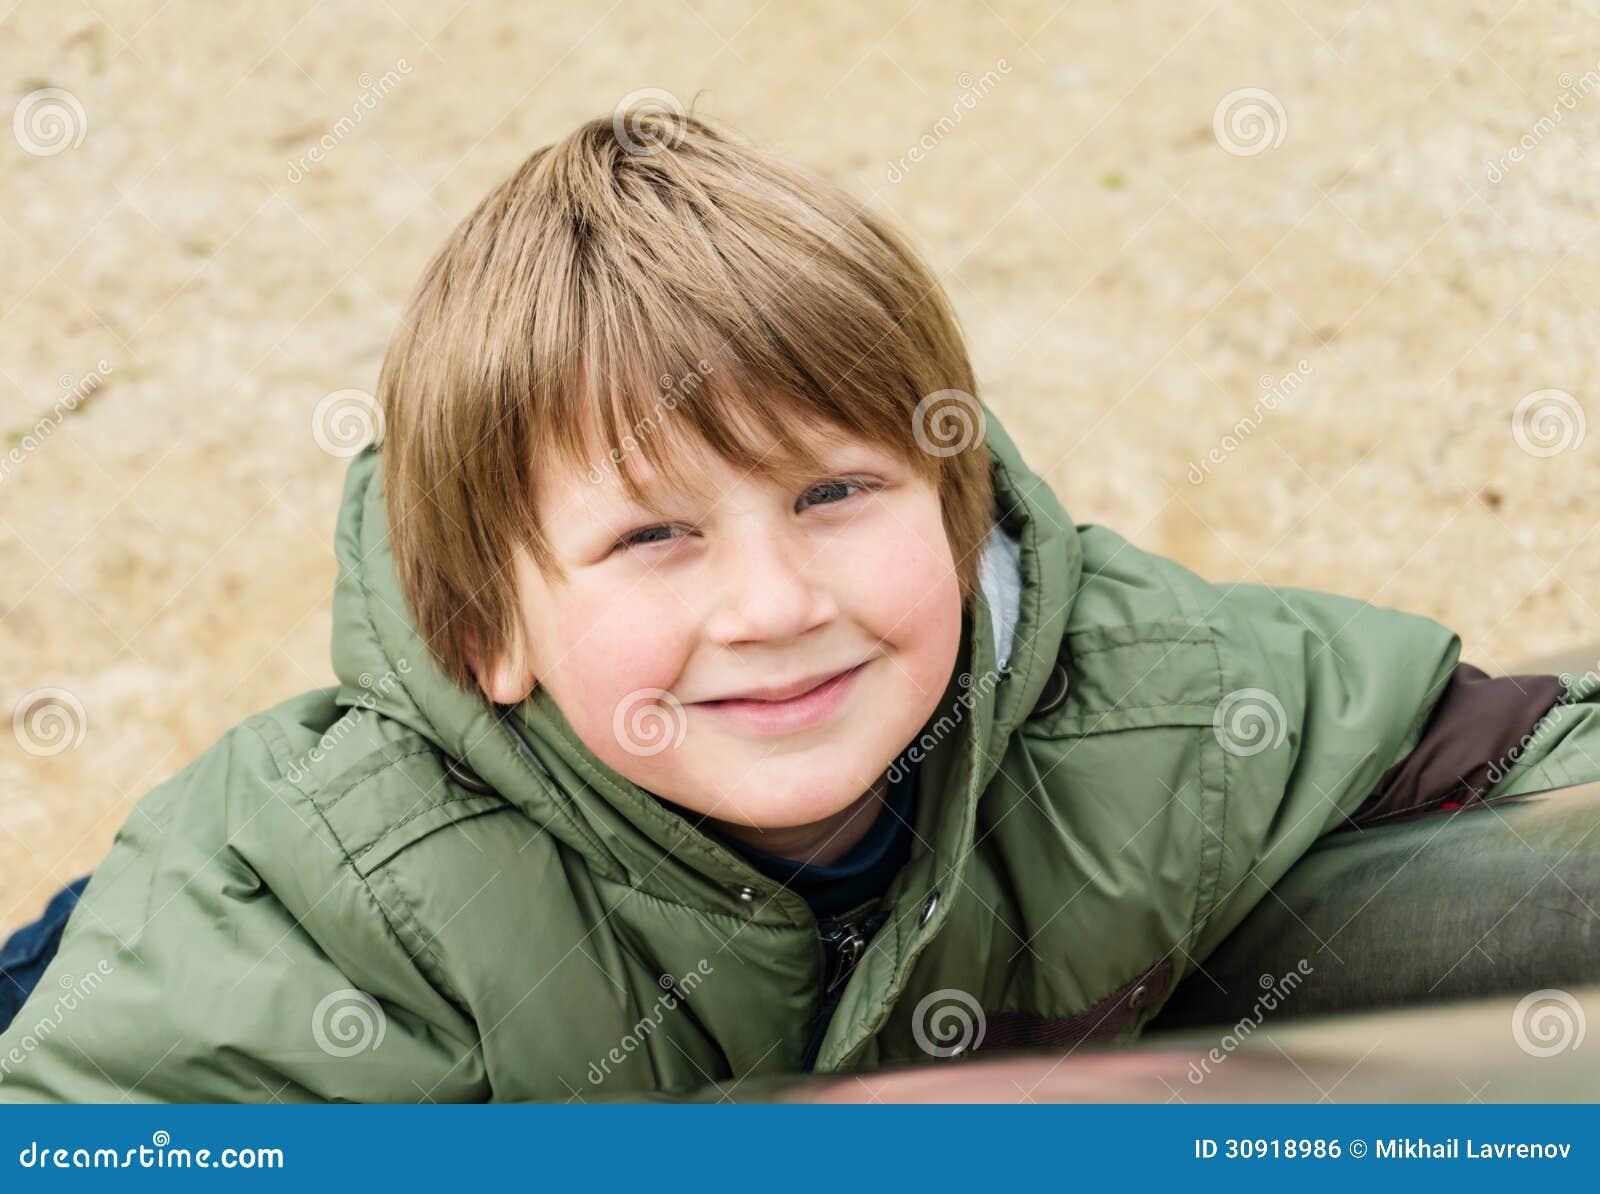 Blond boy enjoying outdoor playground